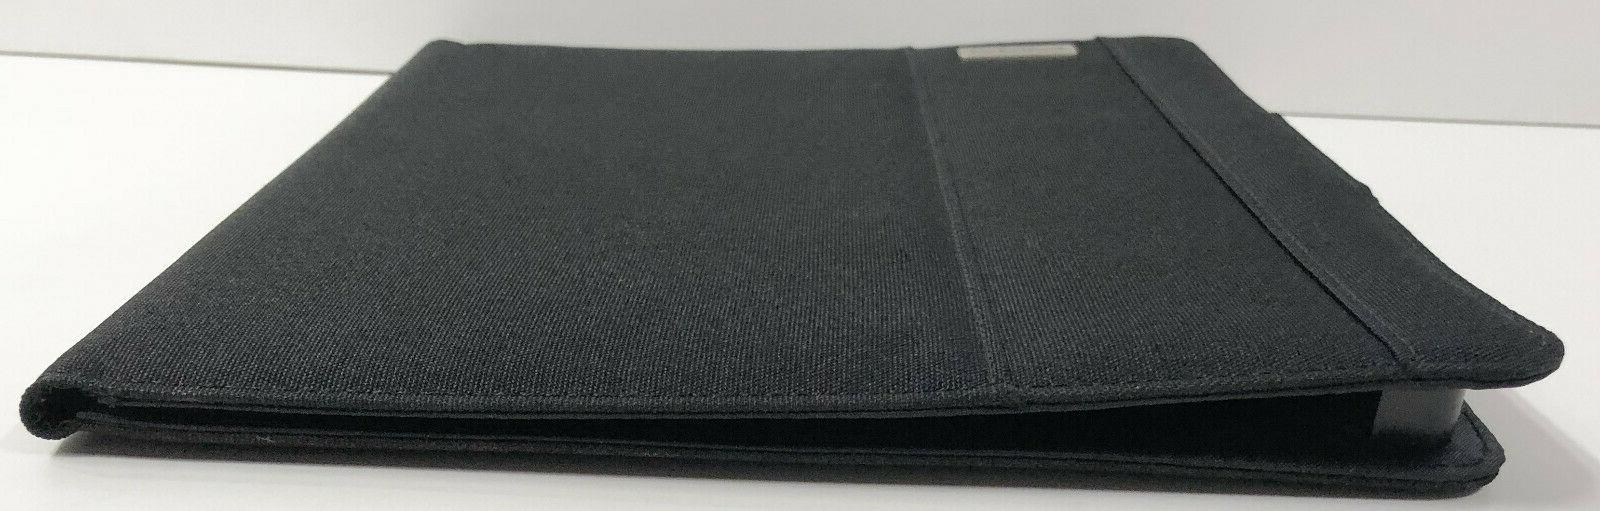 Codi Folding Folio Laptop Cover Chromebook NEW